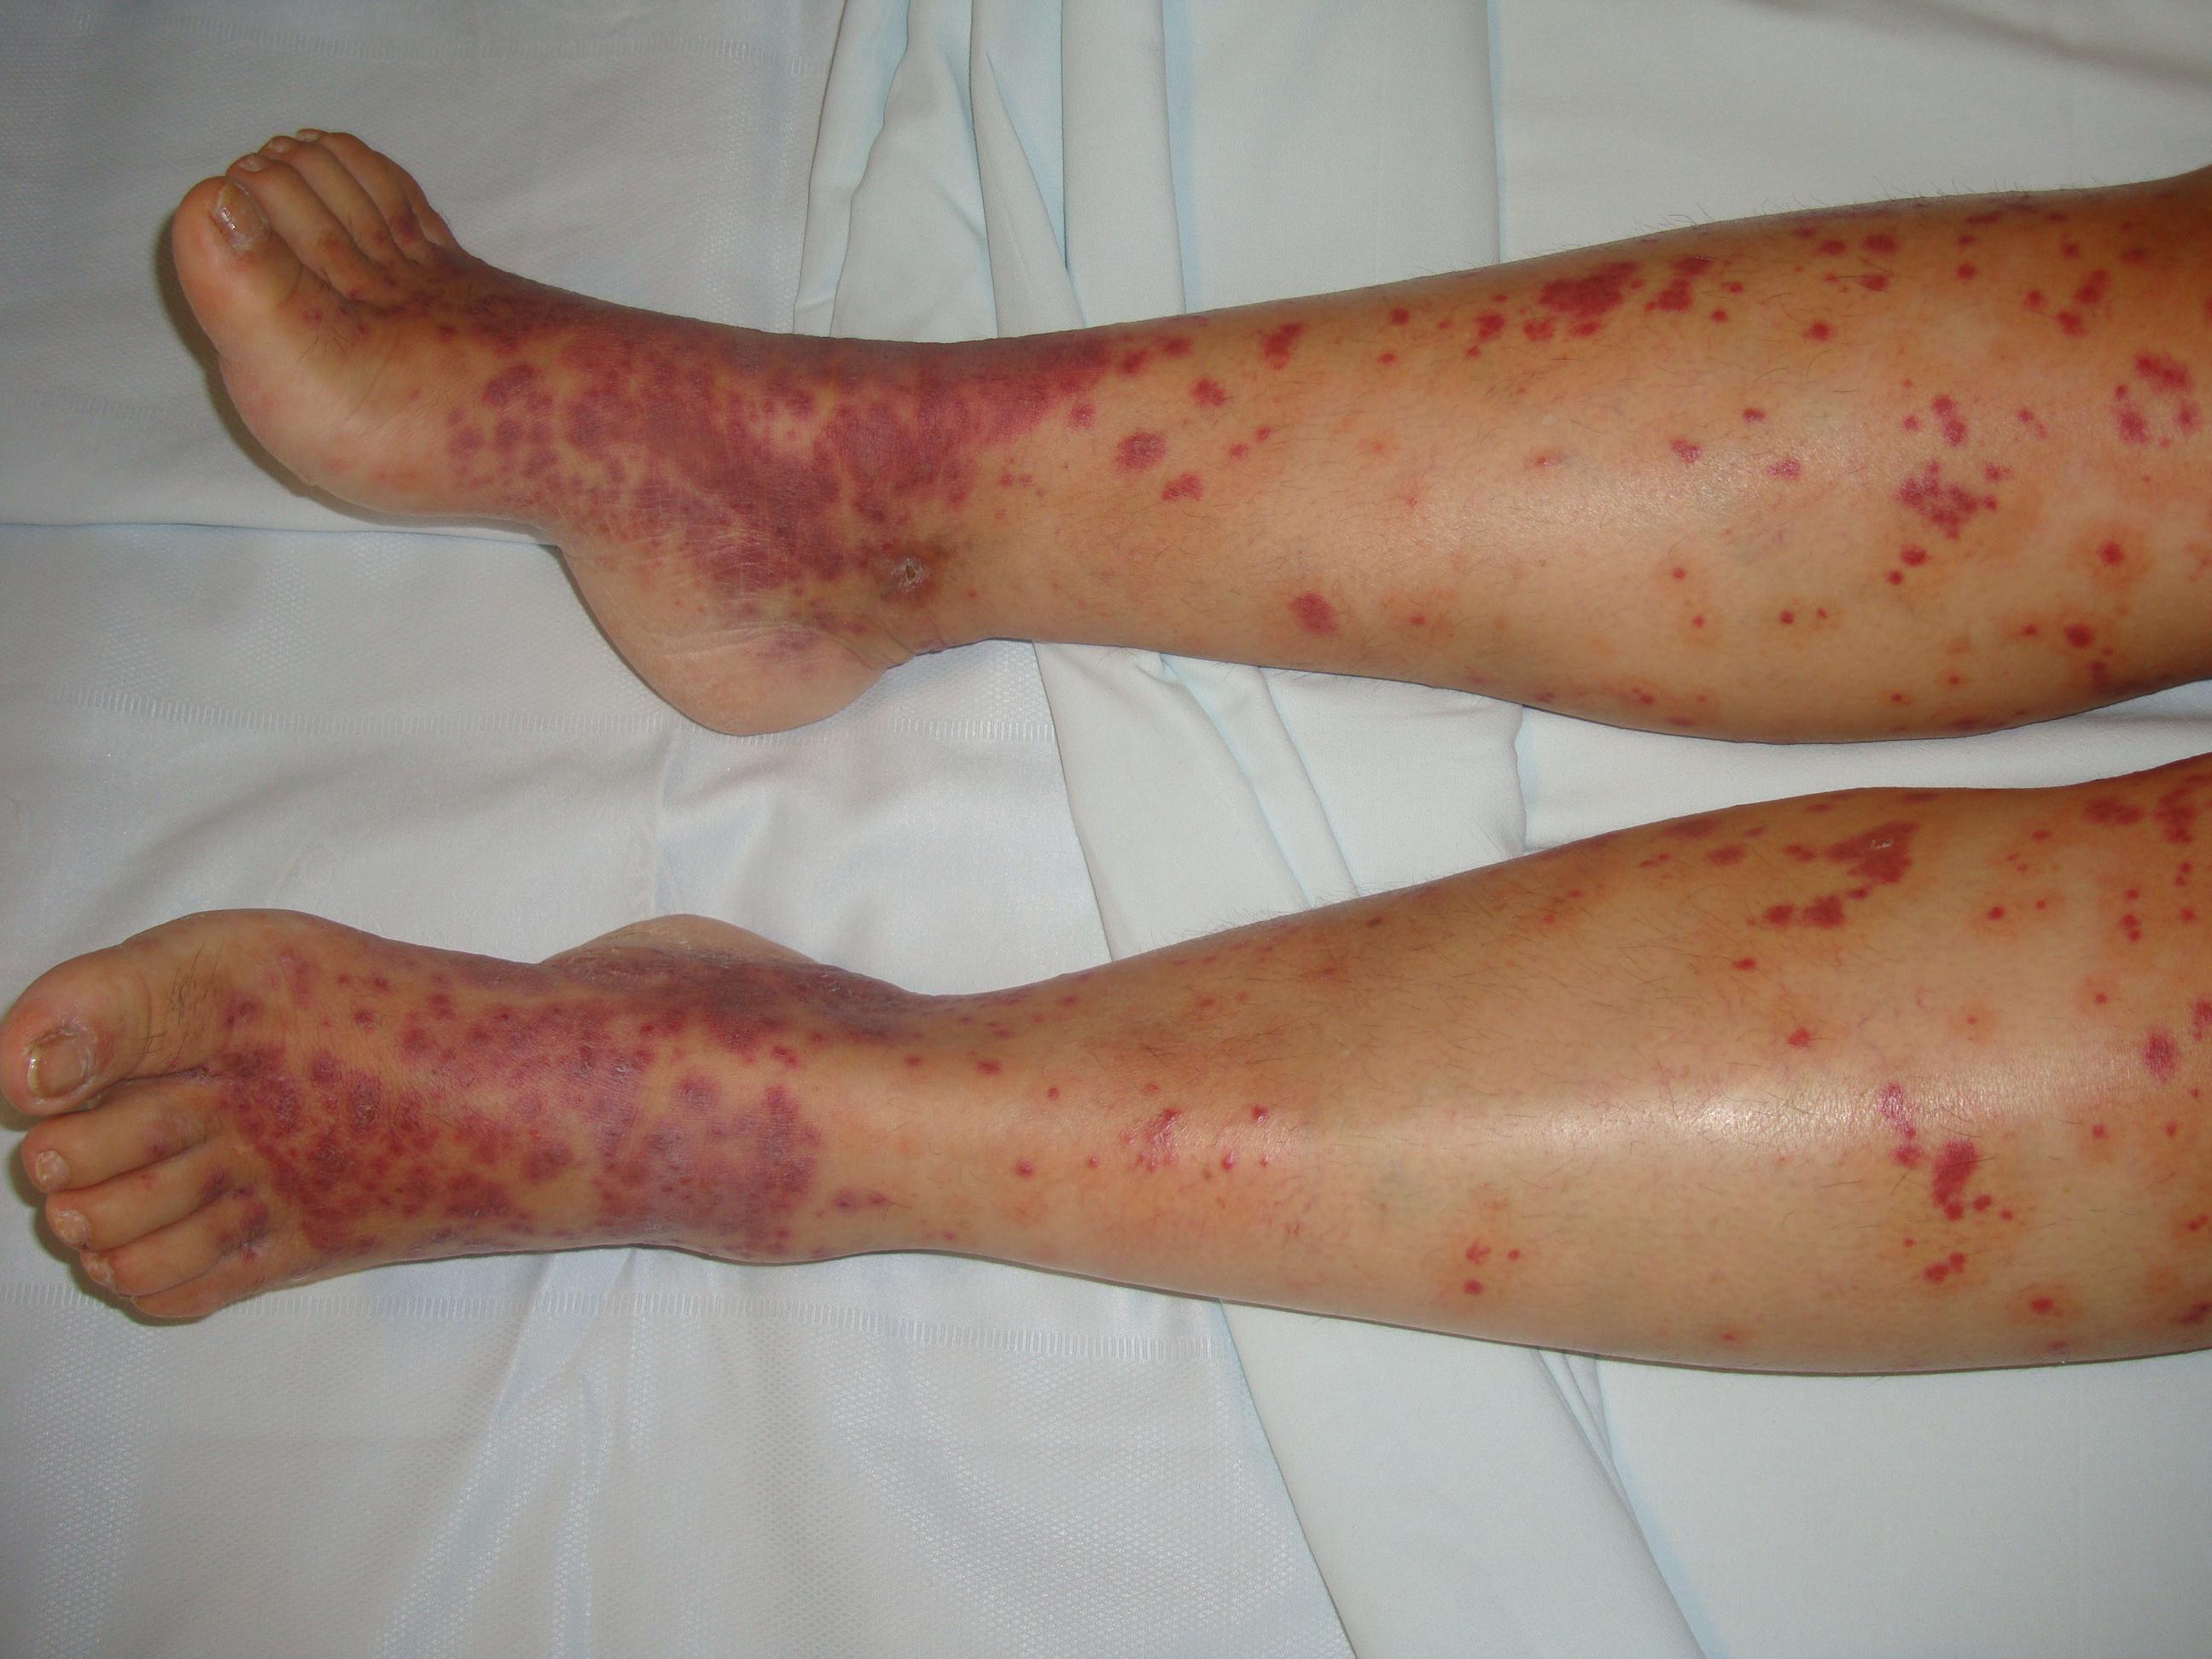 Transient anal rash